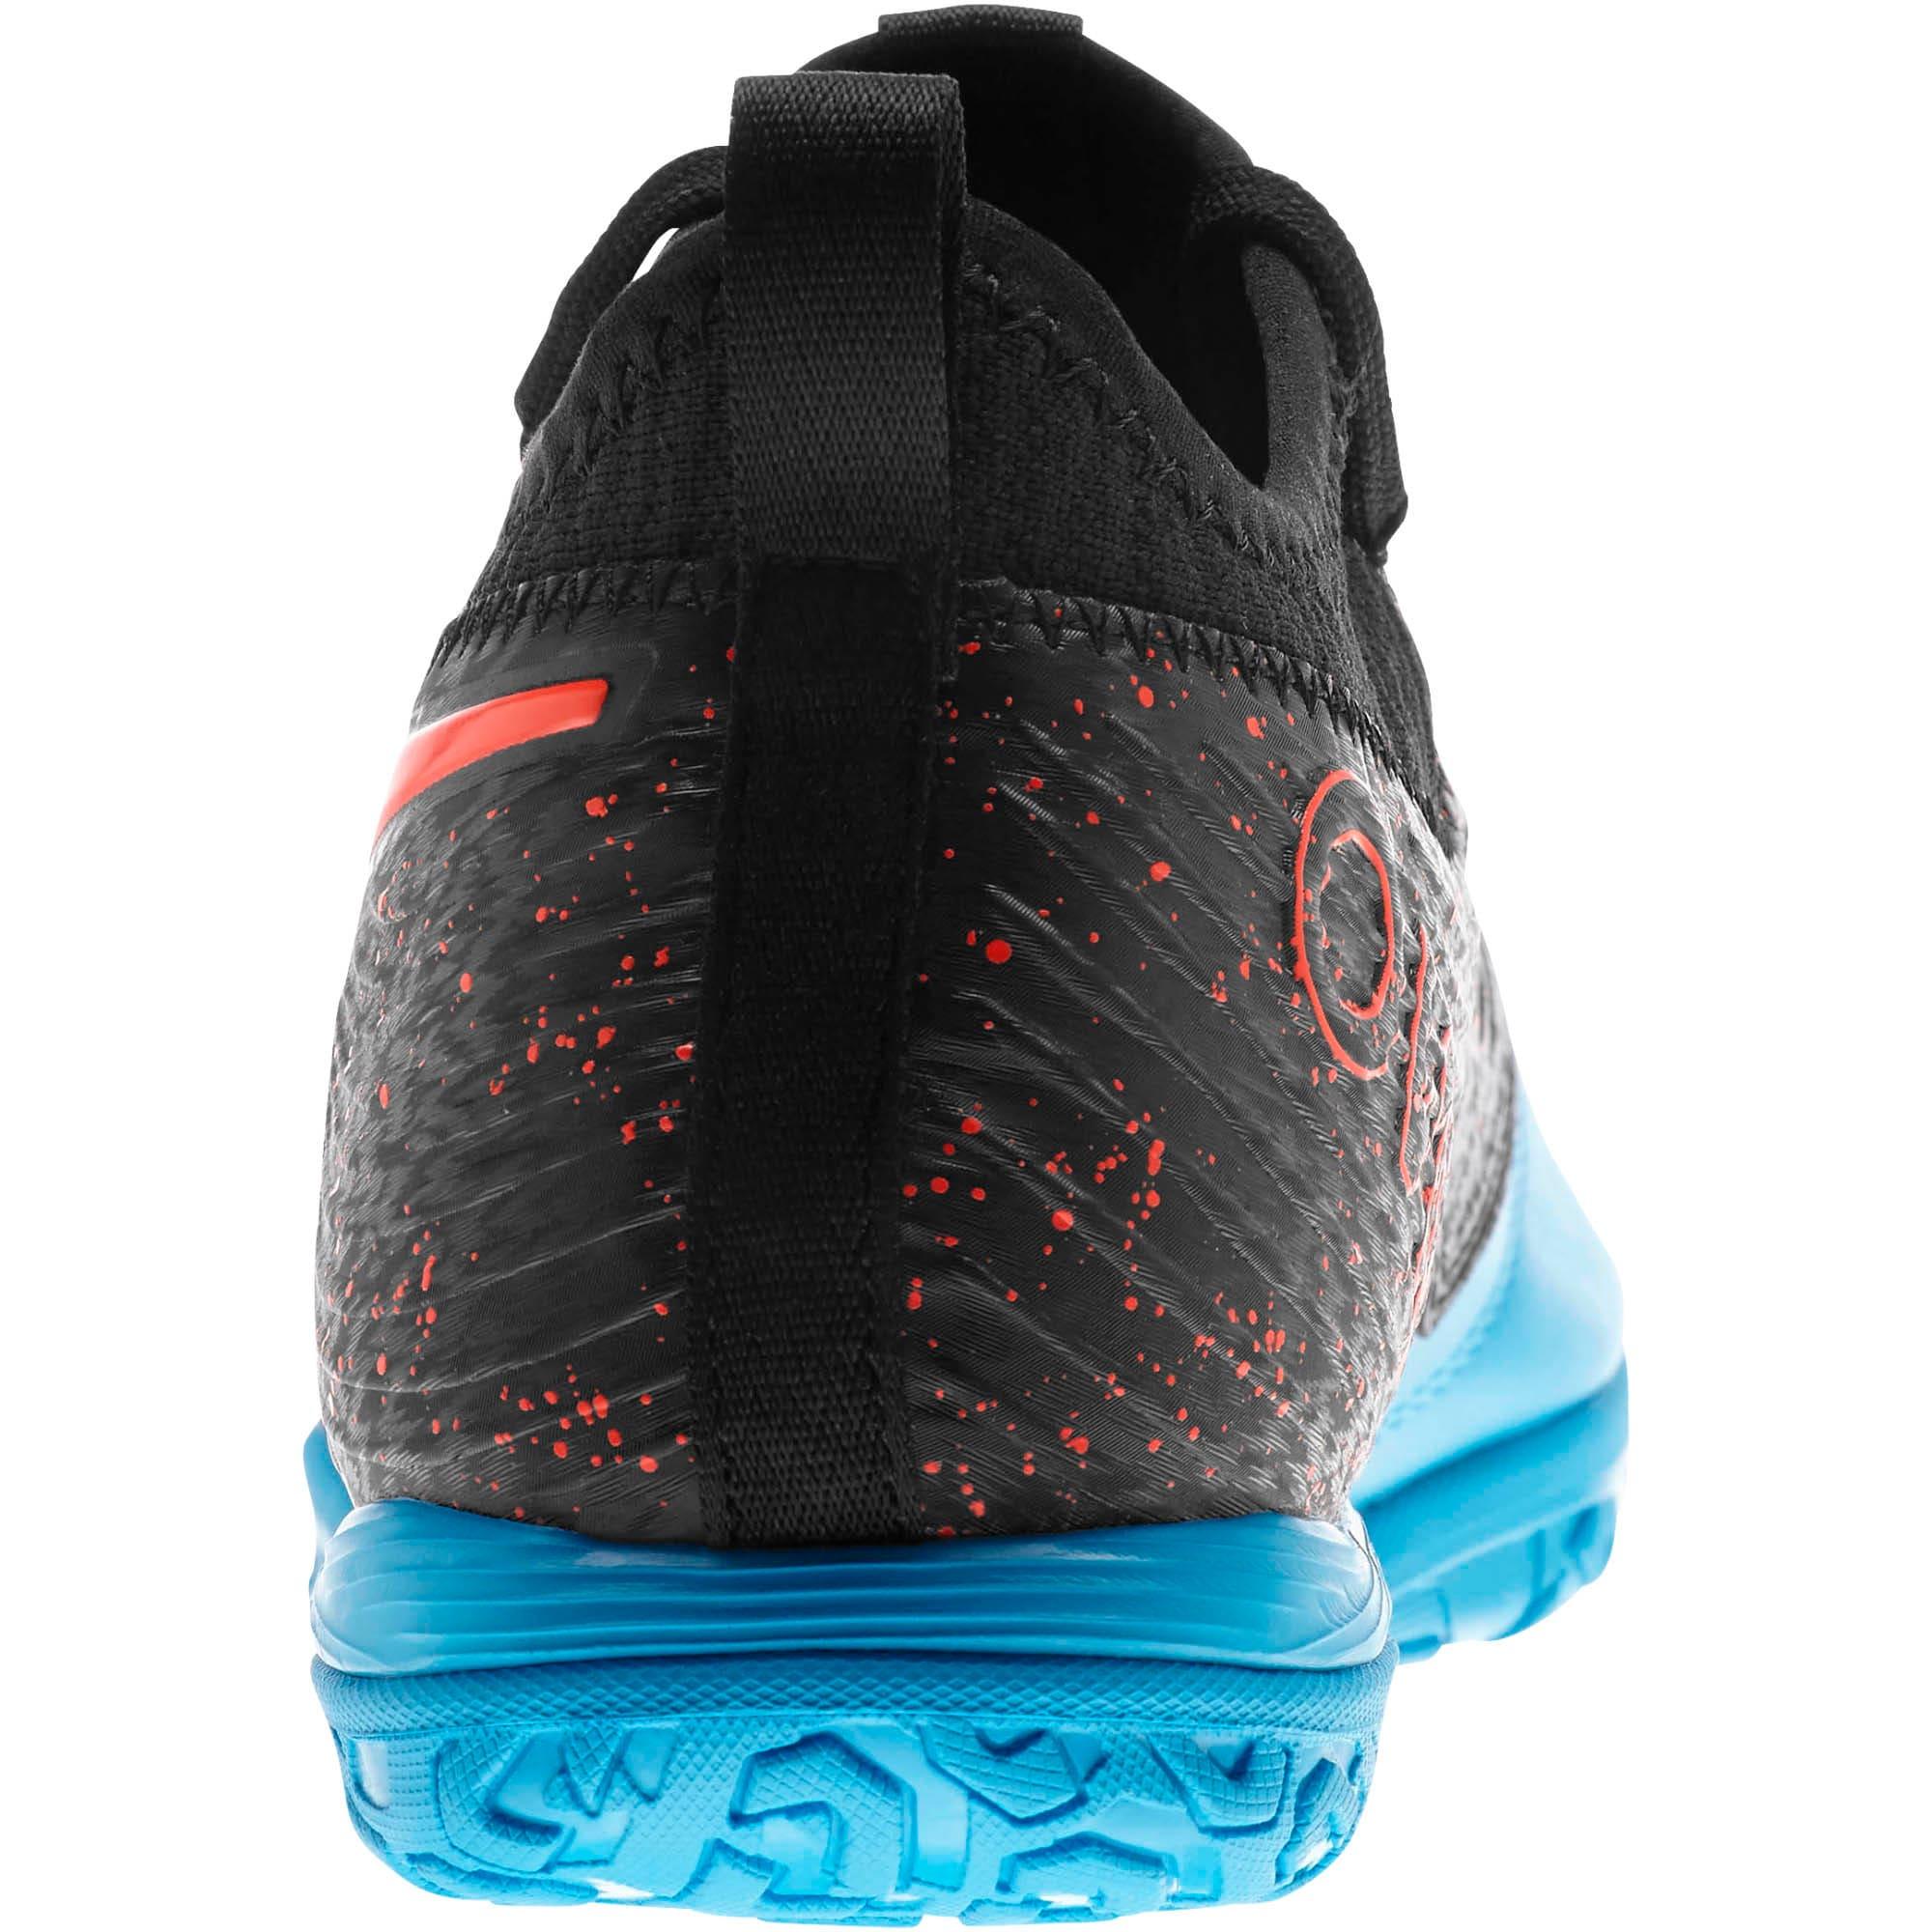 Thumbnail 3 of PUMA ONE 19.3 IT Men's Soccer Shoes, Bleu Azur-Red Blast-Black, medium